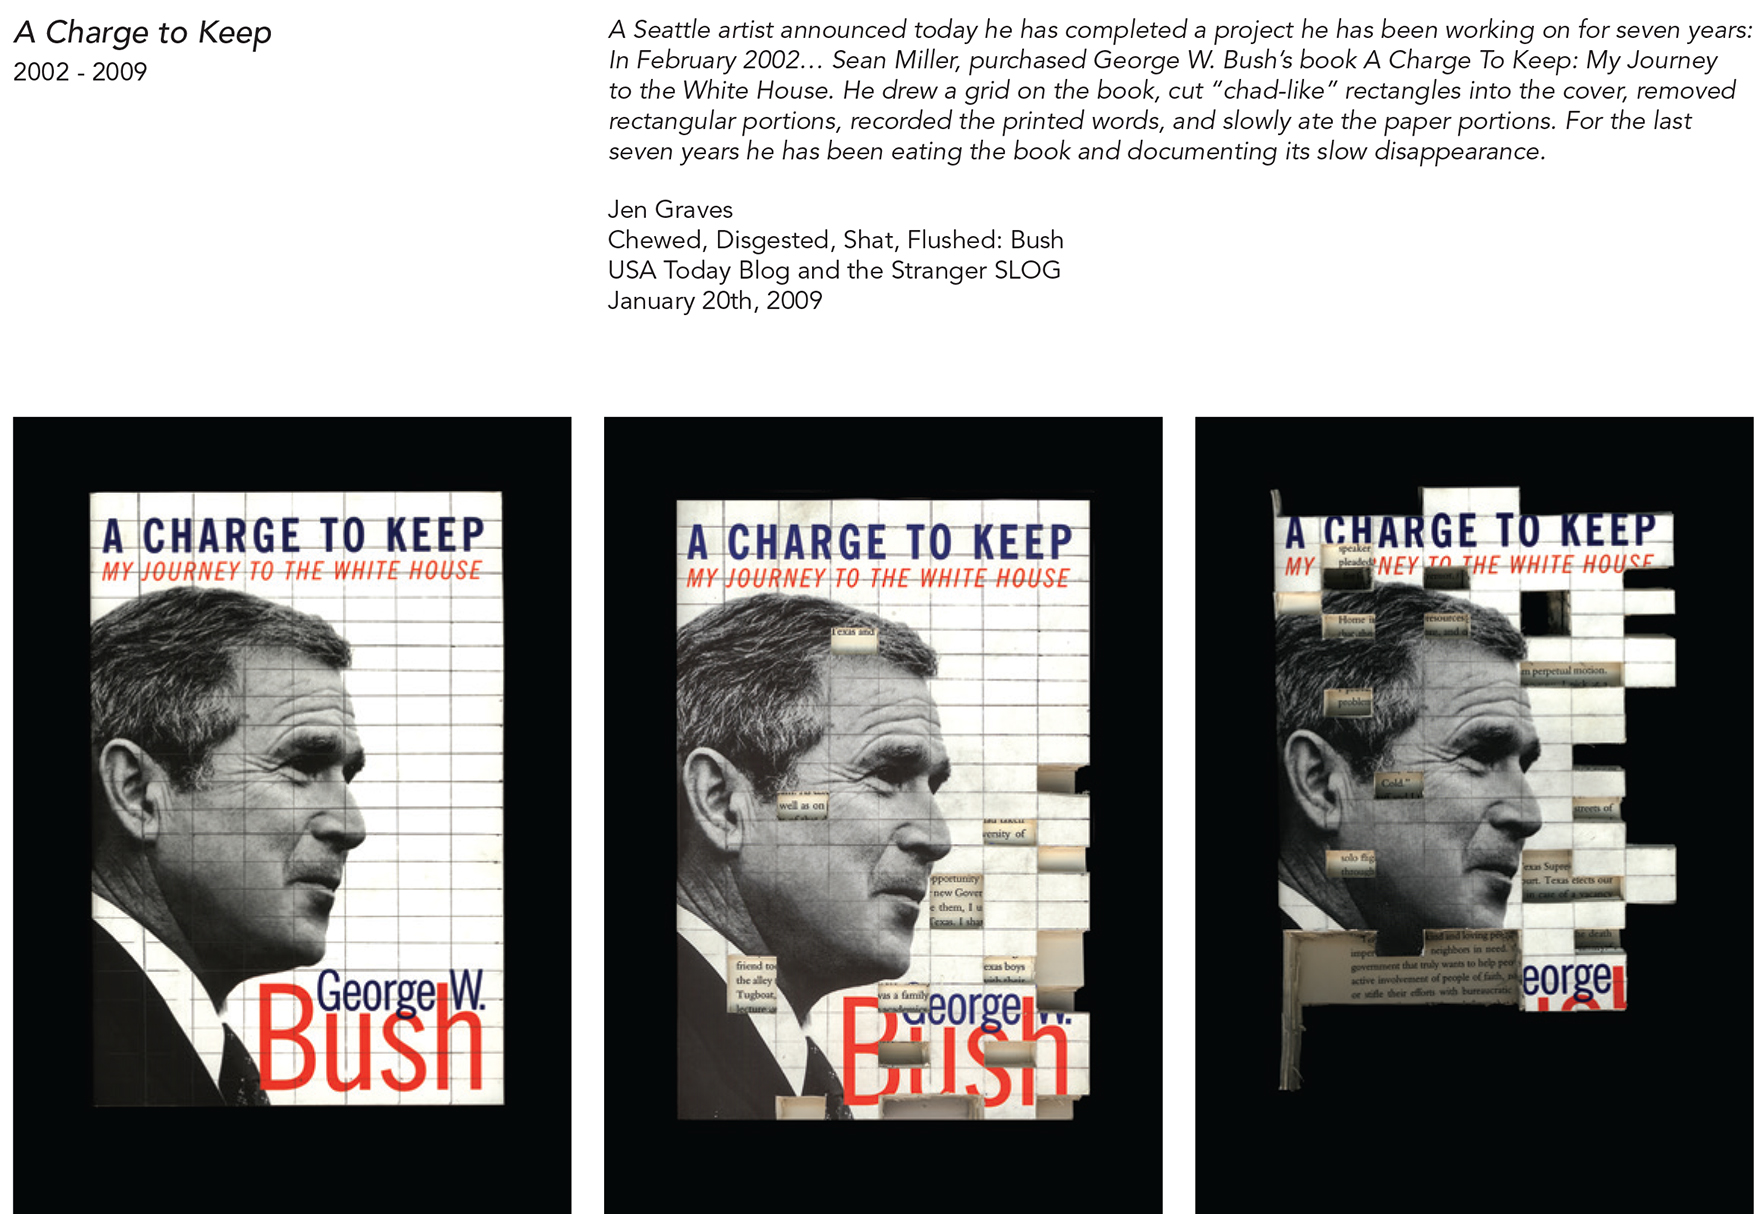 Sean_Miller_Bush_book.jpg